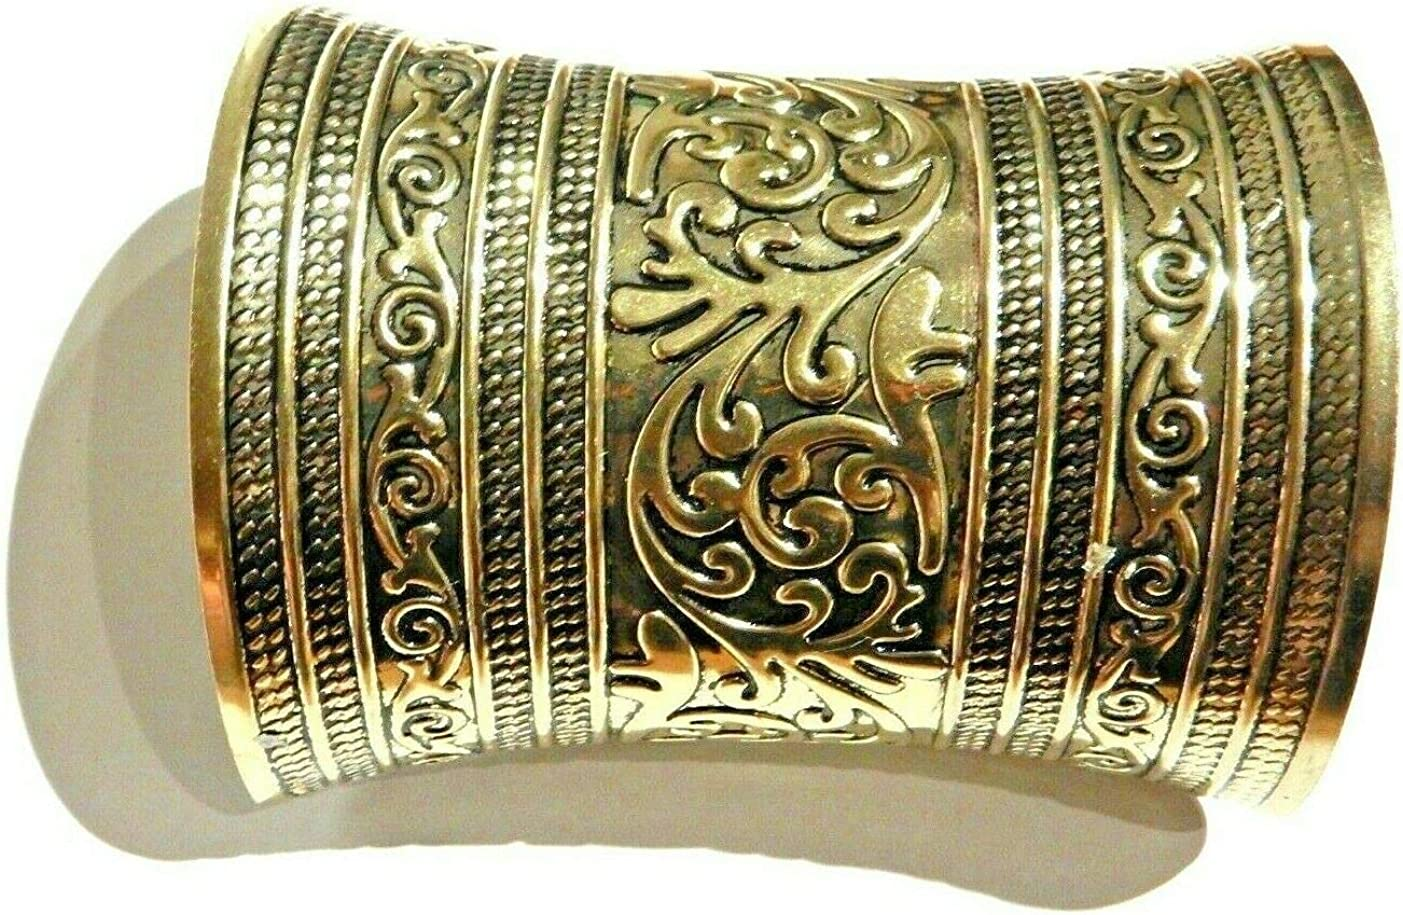 Ornate Brassy Wide Bangle Cuff Ethnic Bali African Stamped Metal Gauntlet Bracer Golden